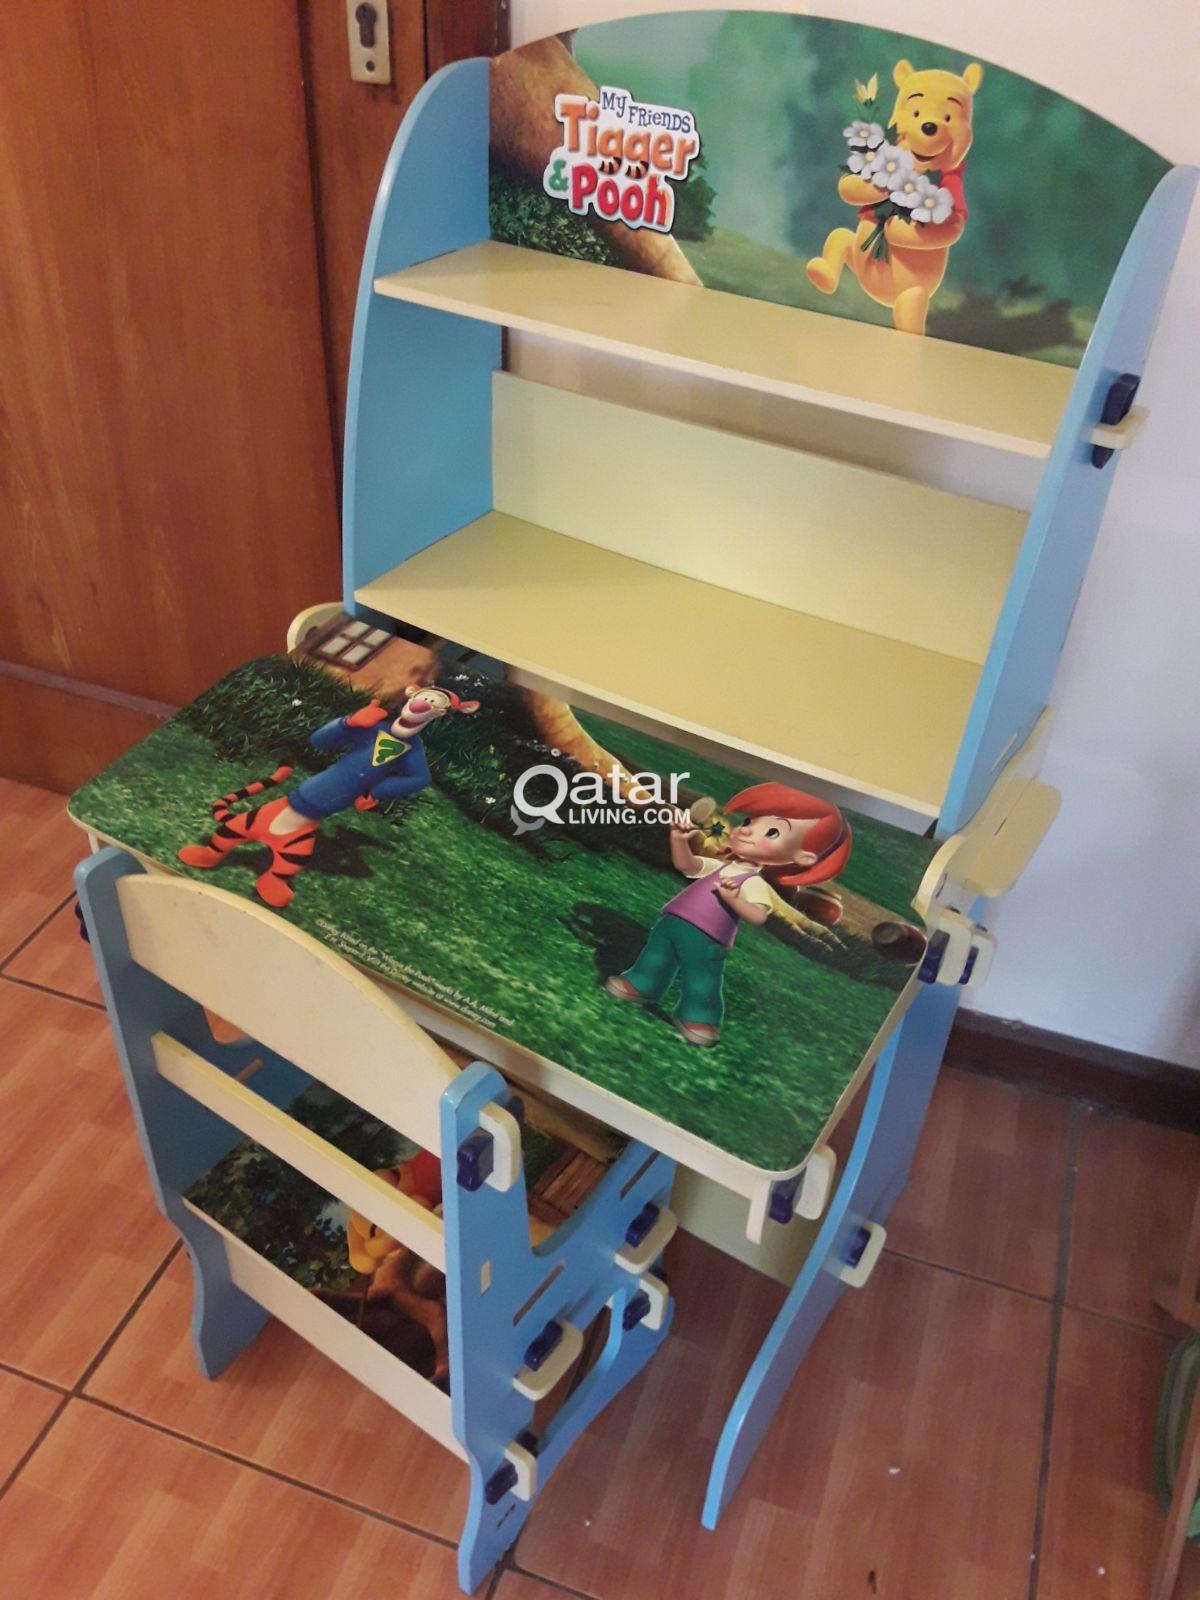 kids study table (home centre) | qatar living